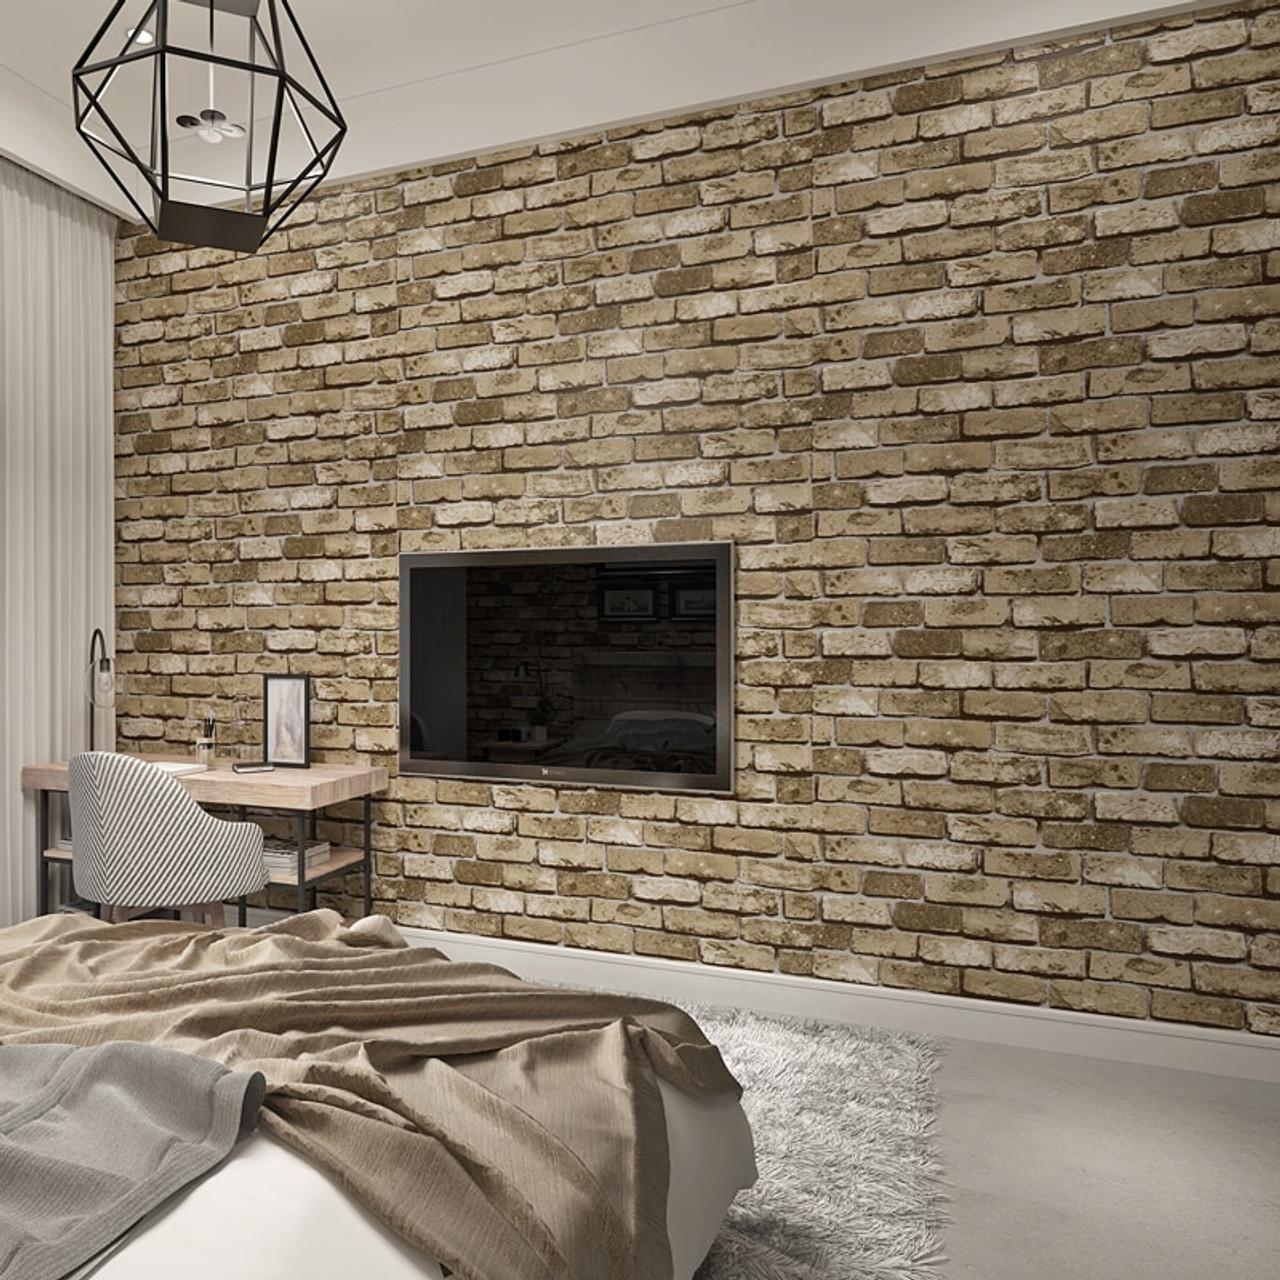 Modern Vintage Brick Textured Wallpaper For Walls Decor Embossed 3D Wall paper Rolls For Bedroom Living  12102.1540307418